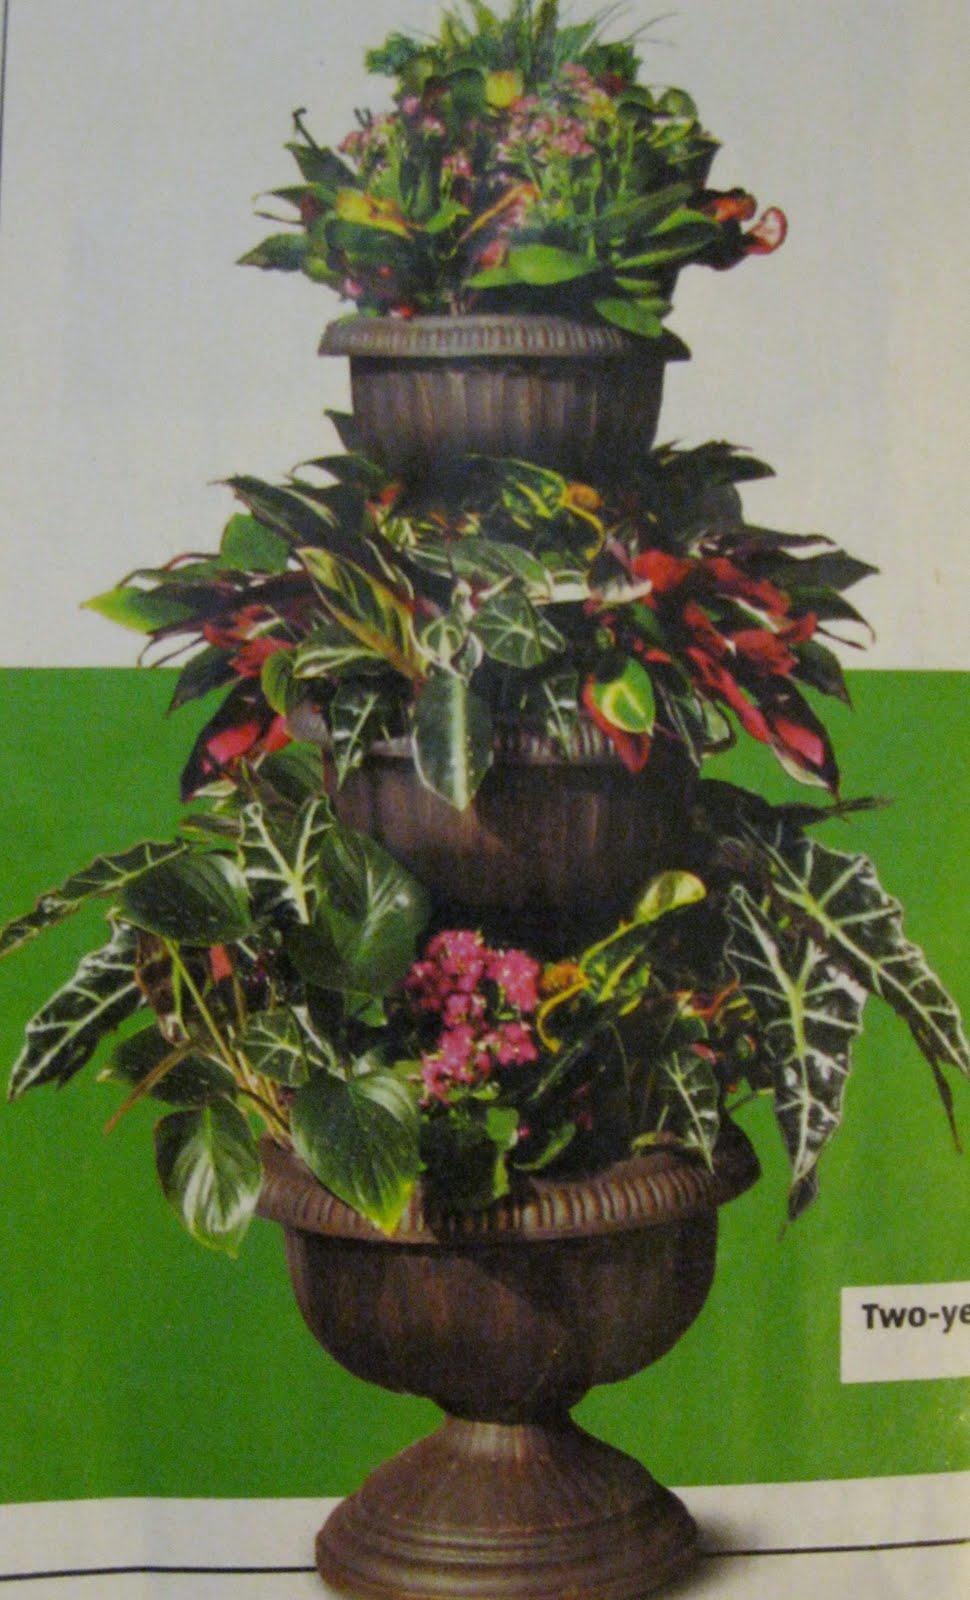 3 Tier Planter Aldi : planter, Helping, Save:, Prices, Starts, Some)